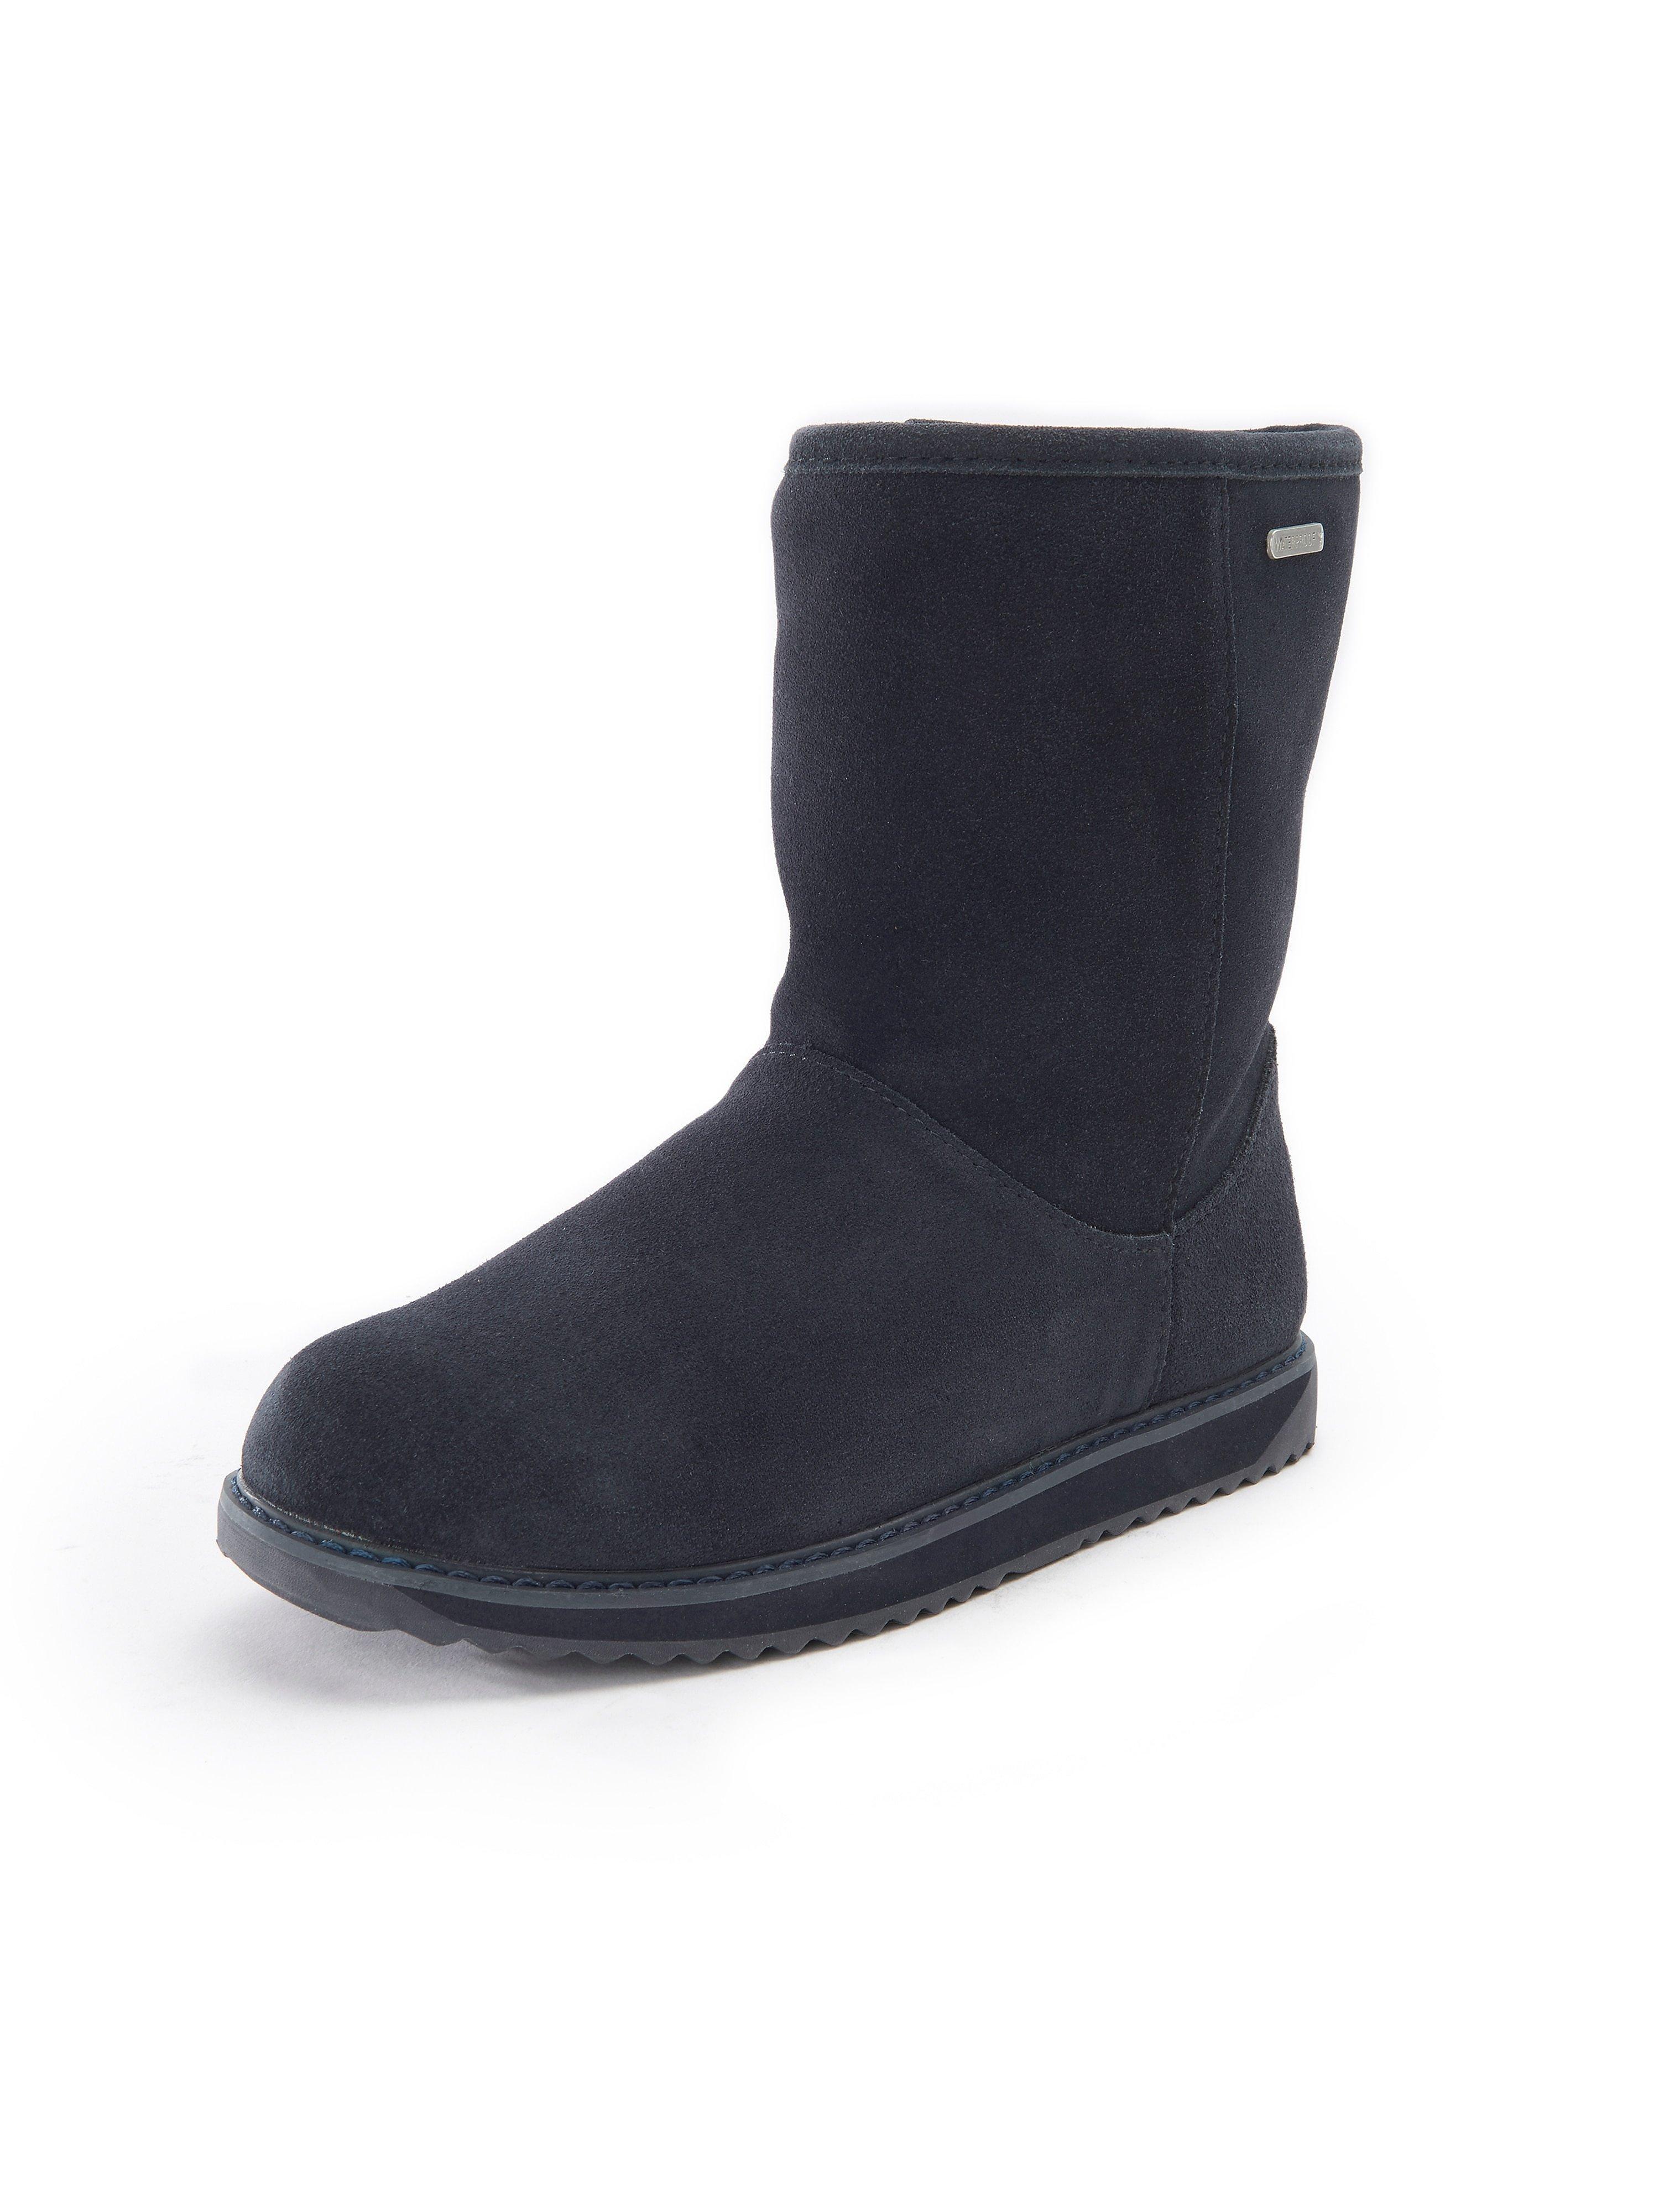 Les bottines  Emu bleu taille 42